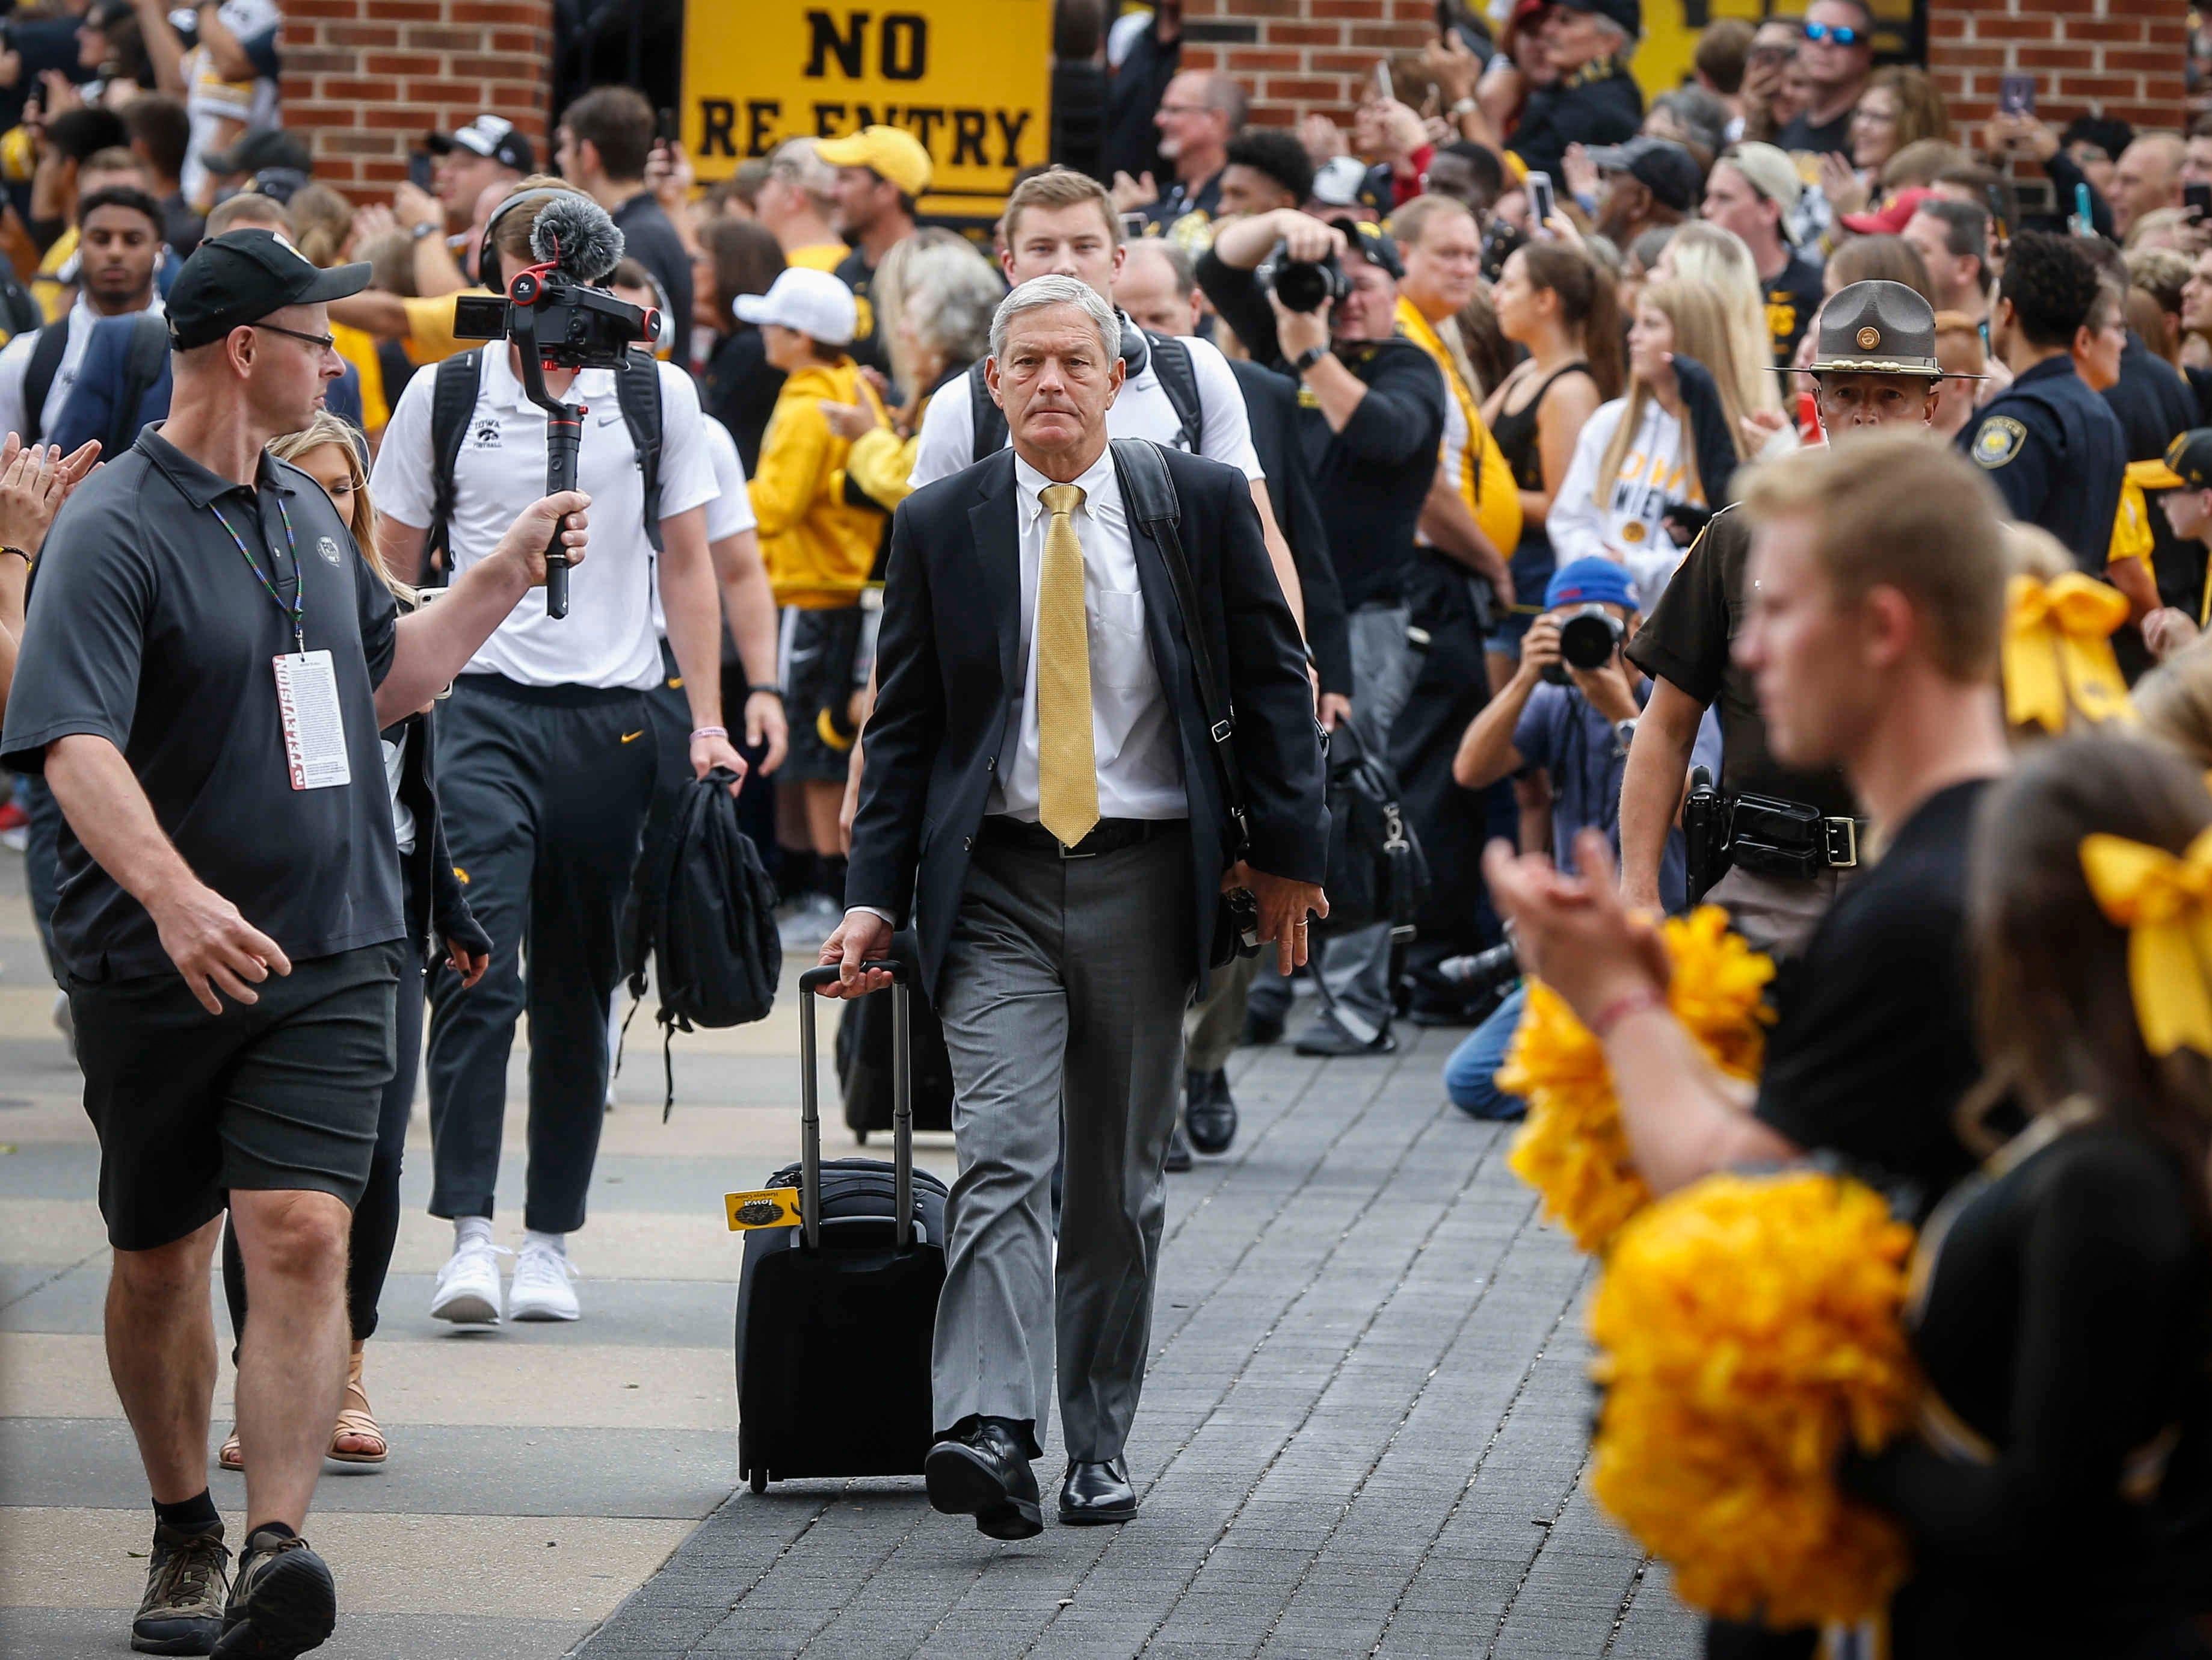 Iowa head football coach Kirk Ferentz makes his walk to the stadium prior to kickoff against Iowa State on Saturday, Sept. 9, 2018, at Kinnick Stadium in Iowa City.